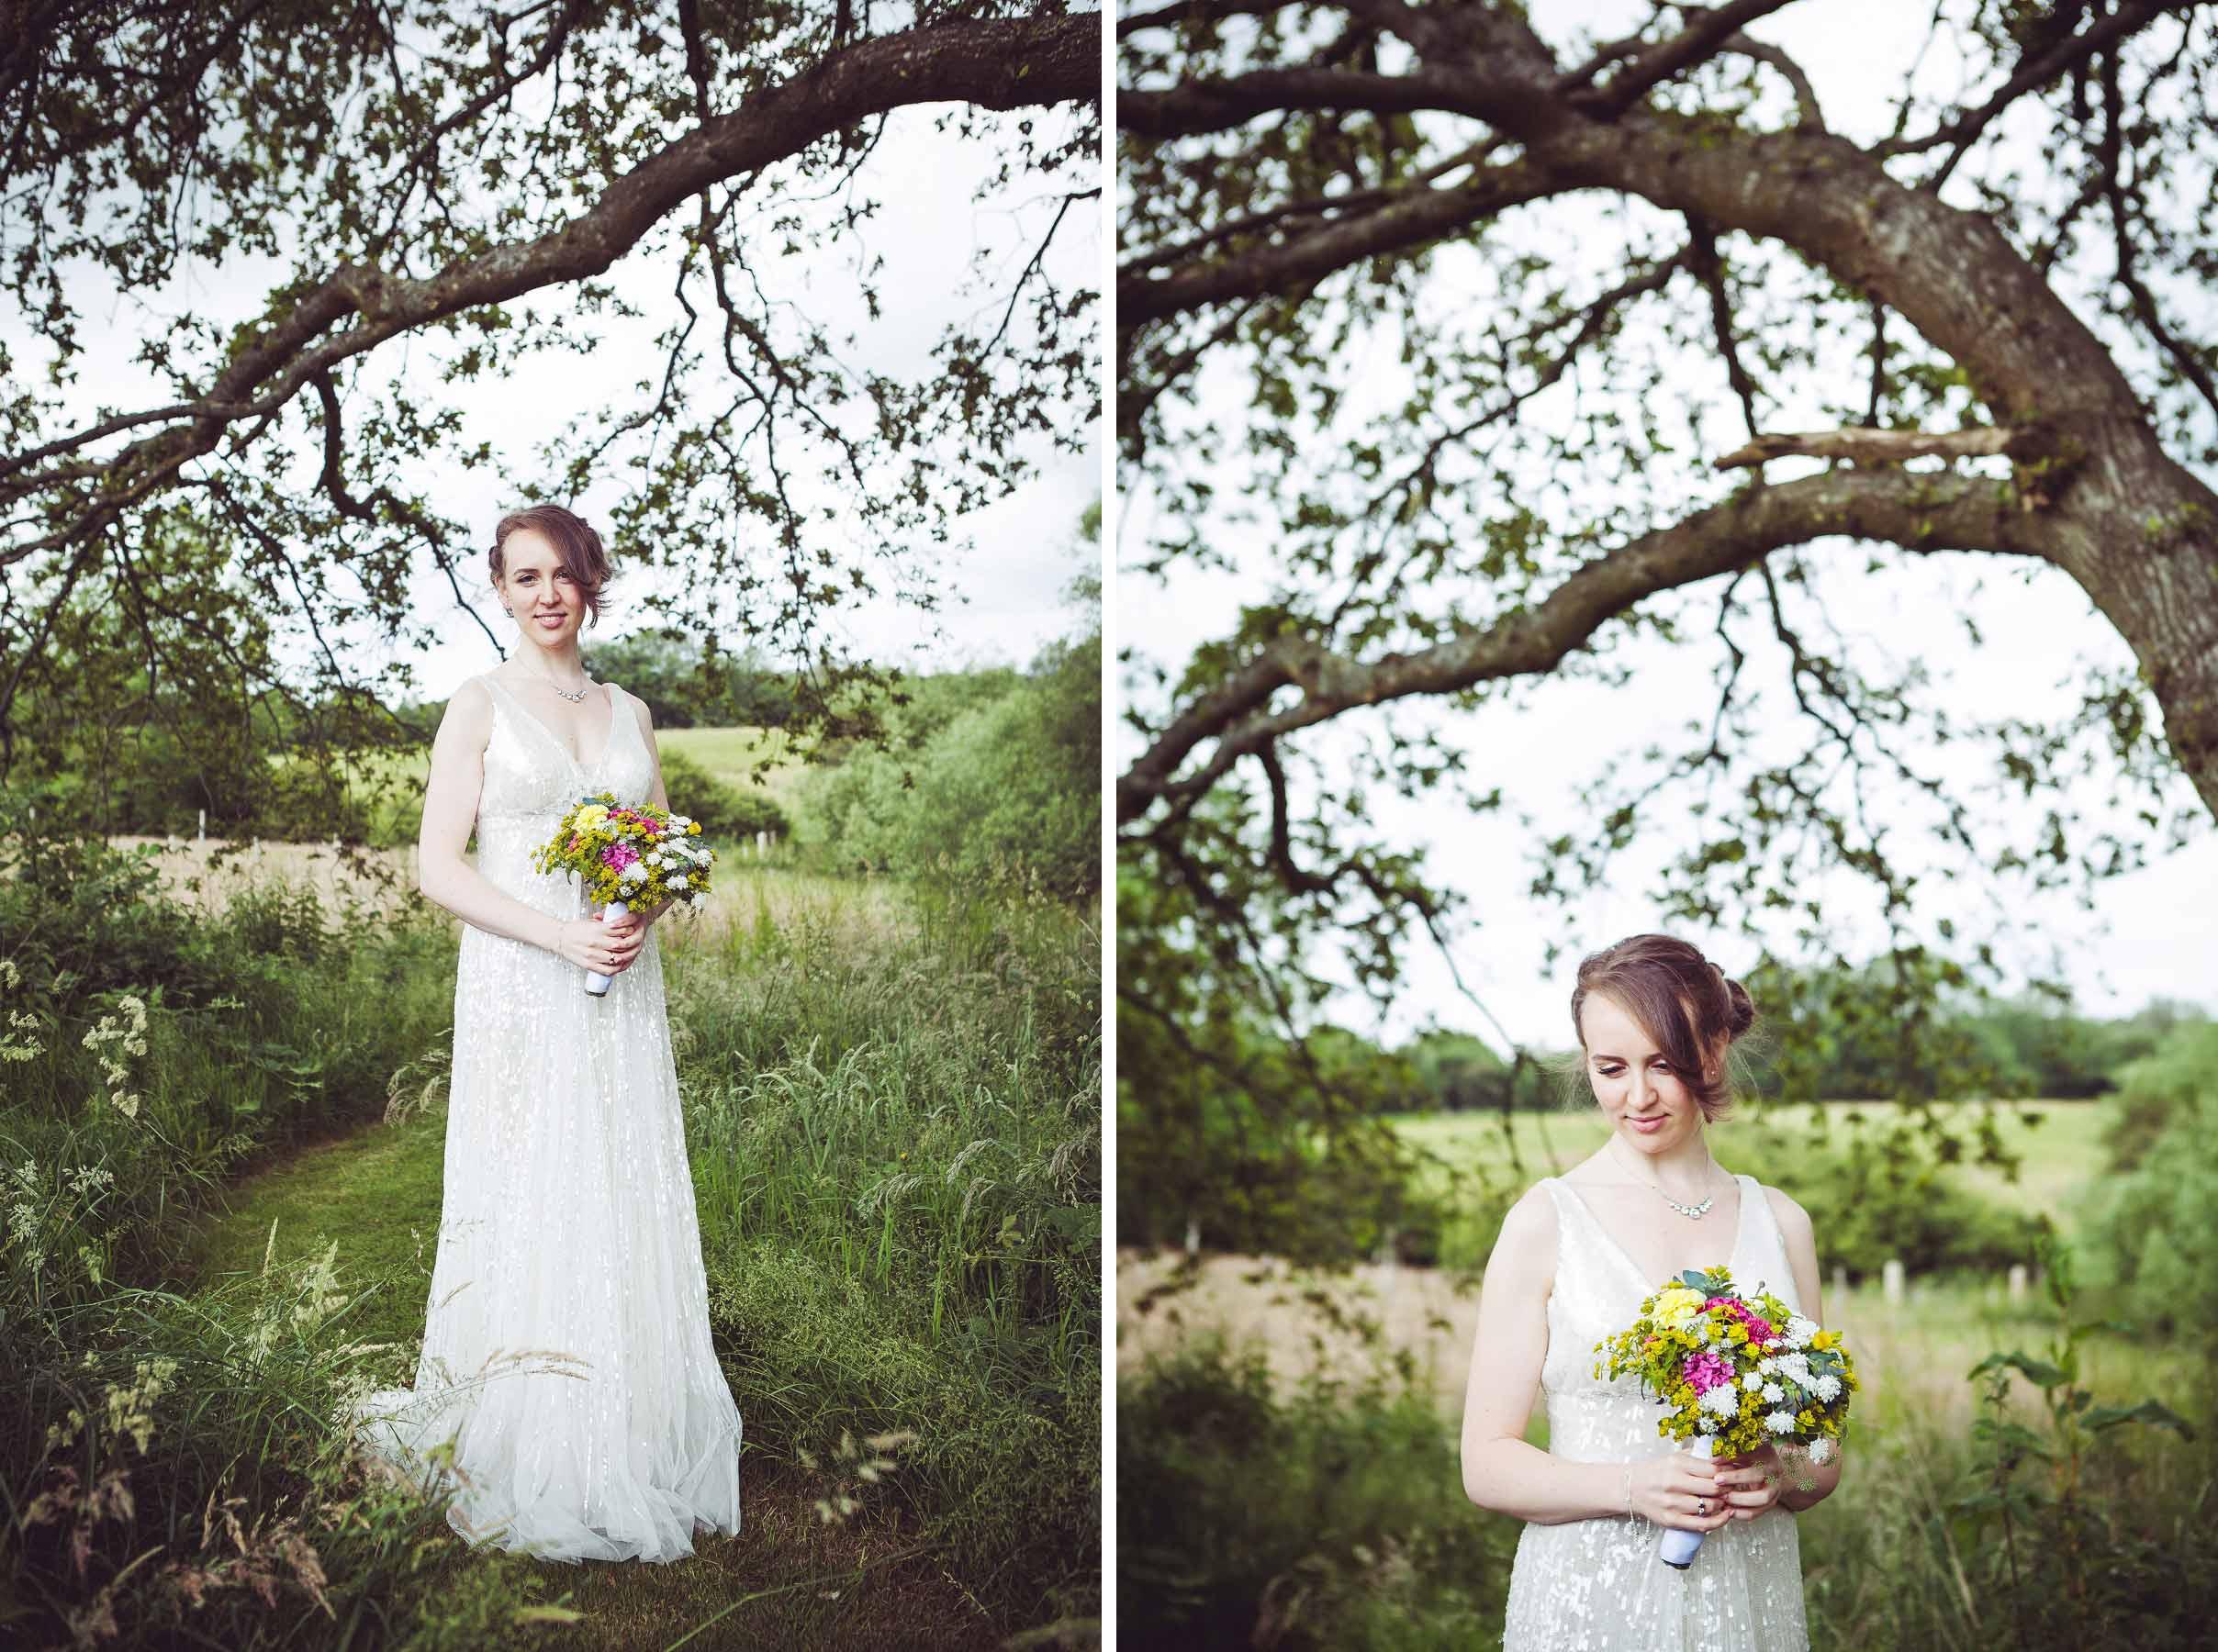 Sussex Wedding at Hawthbush Farm 15